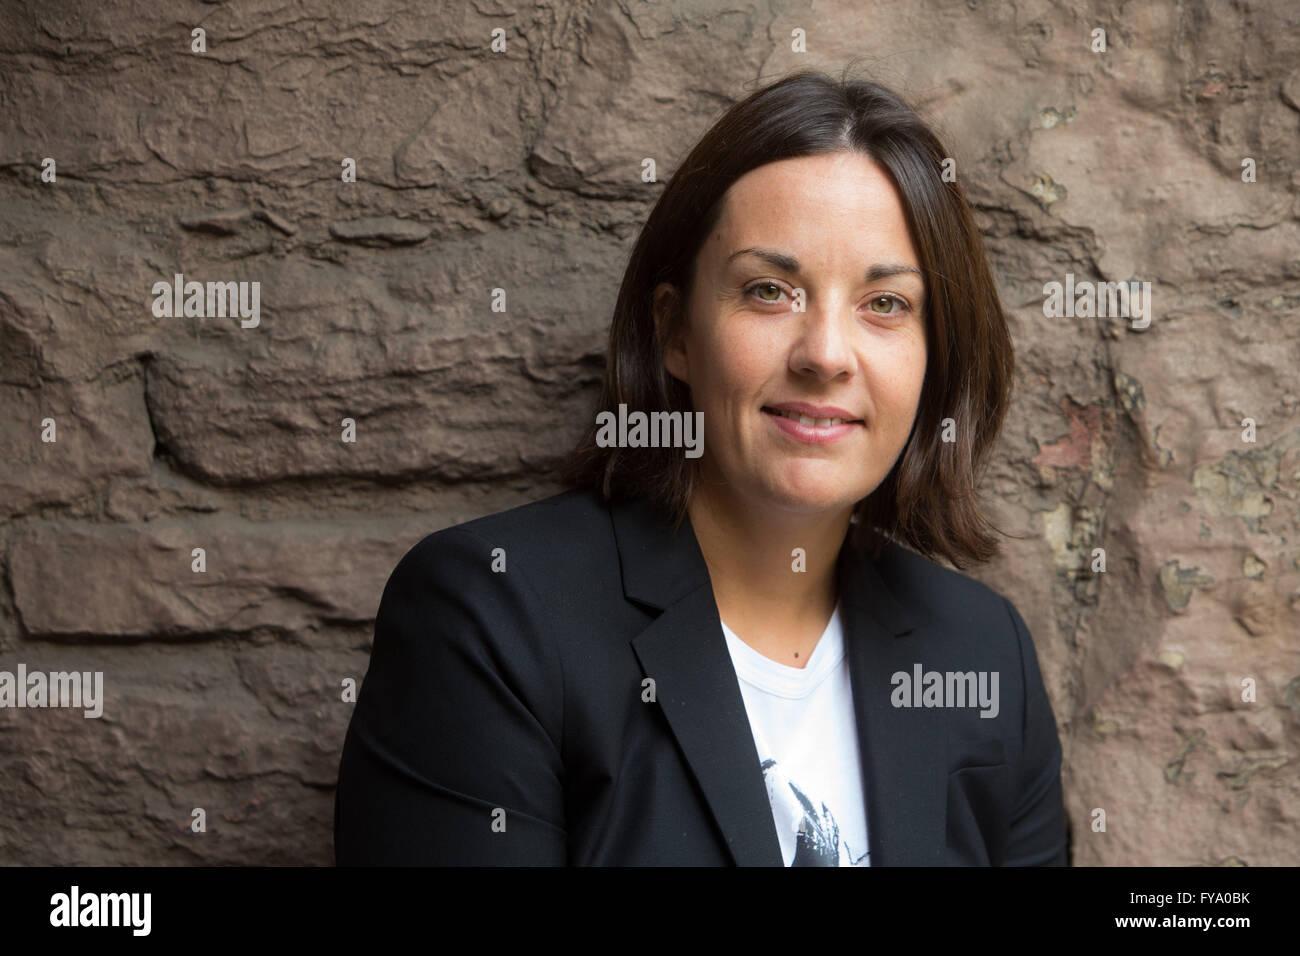 Scottish Labour Leader Kezia Dugdale at Edinburgh Festival - Stock Image